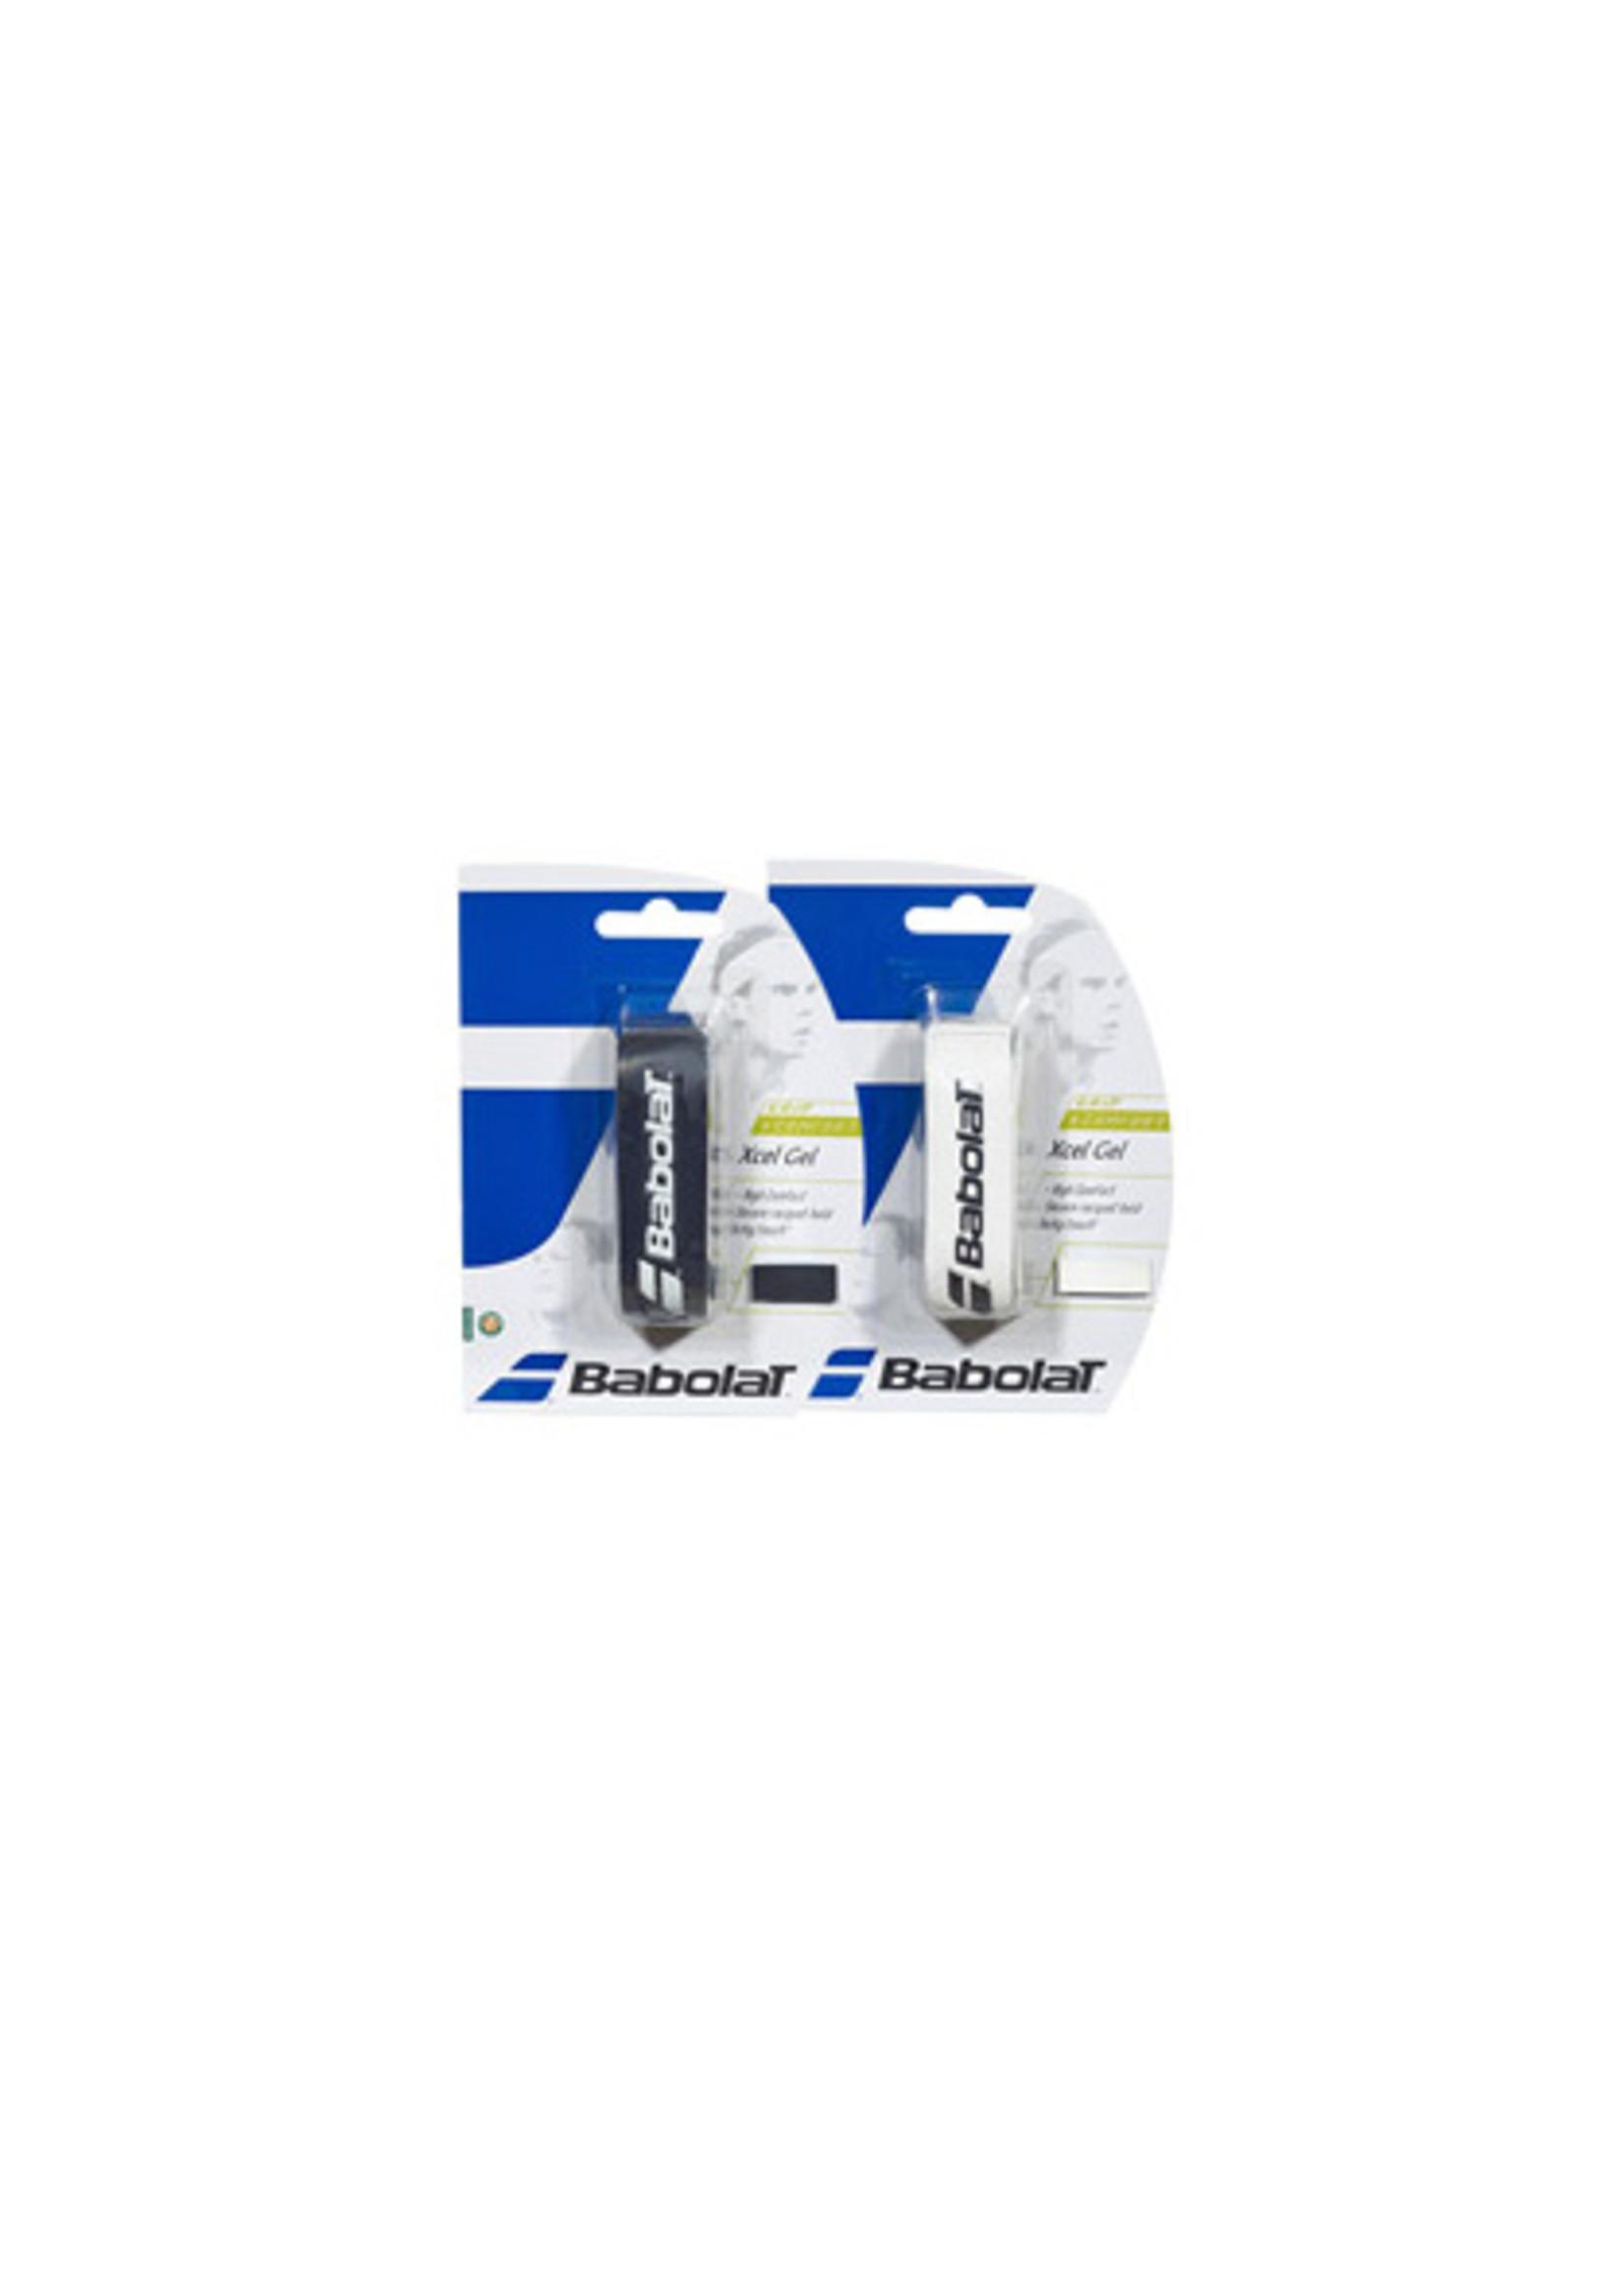 Babolat Babolat Xcel Gel Replacement Grip (2018)